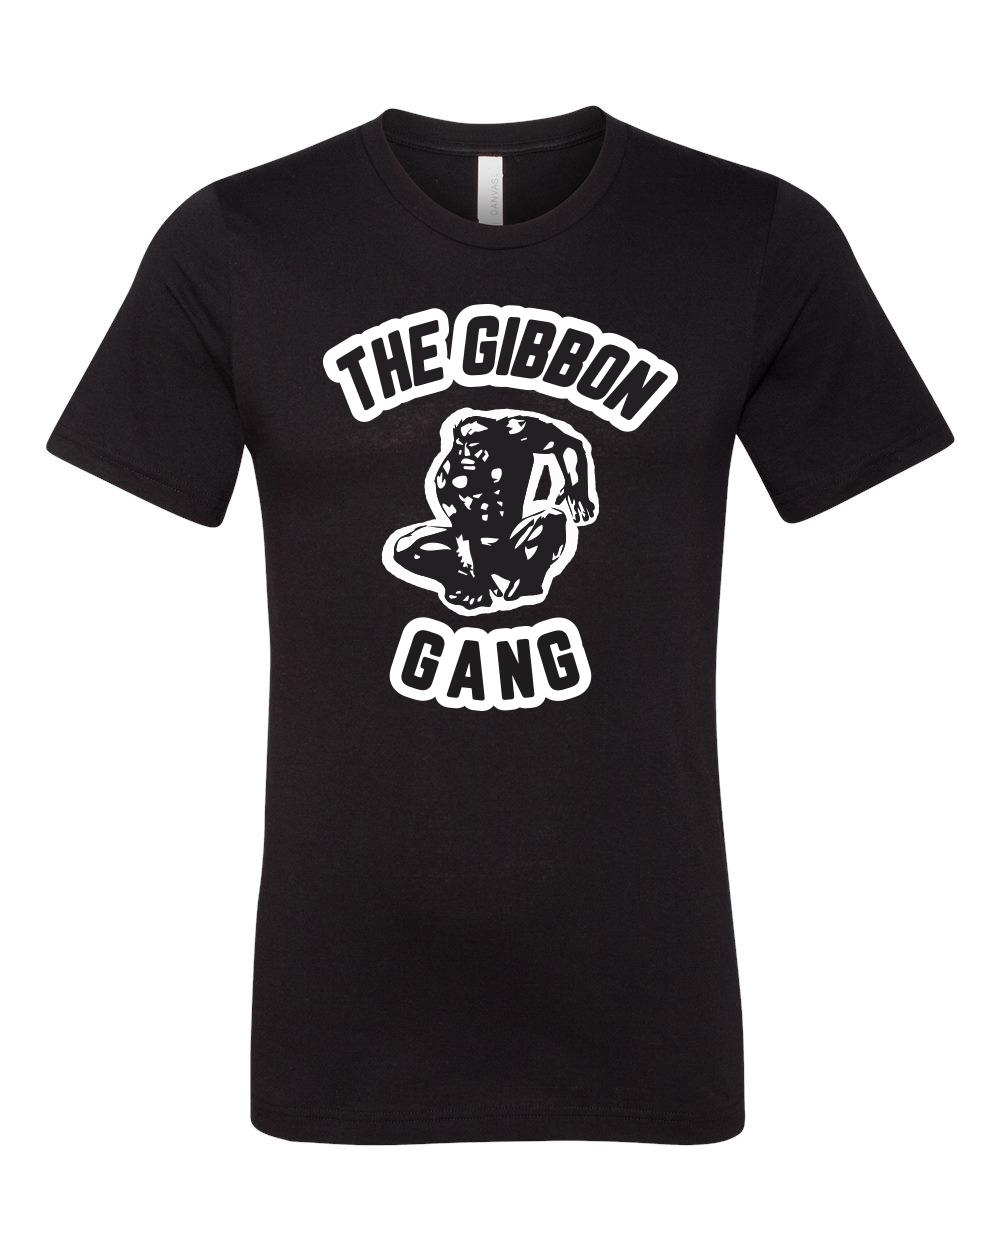 Gibbon Gang